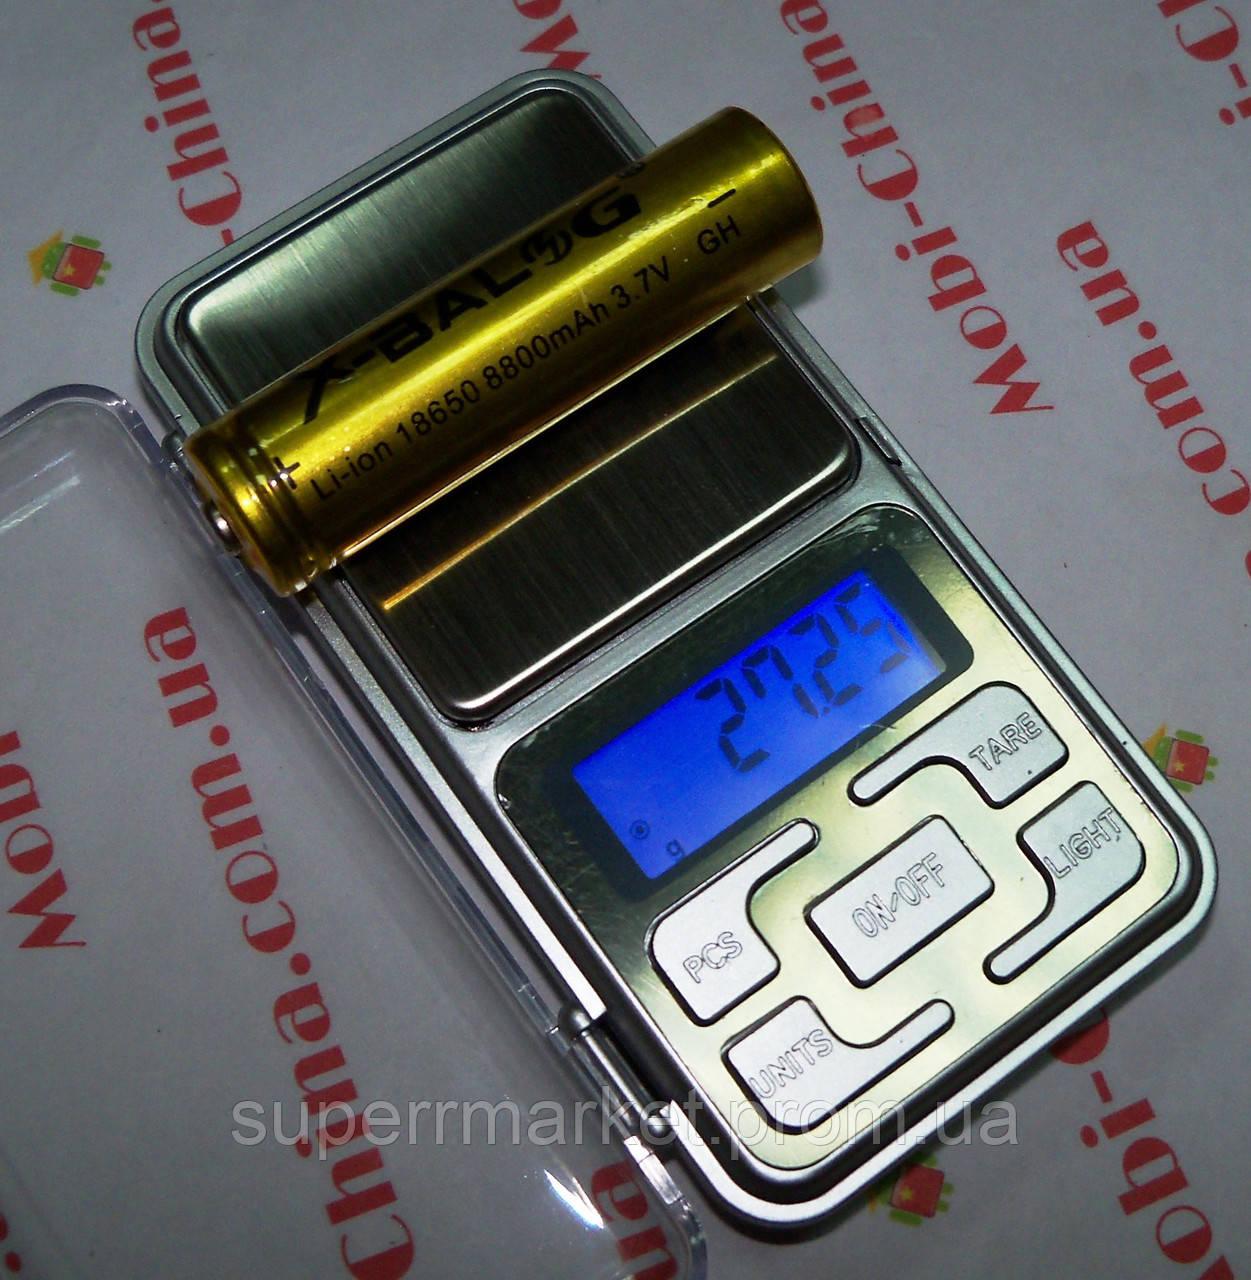 Аккумулятор Li-Ion x-balog 3.7-4.2V 8800mAh 18650  золотой